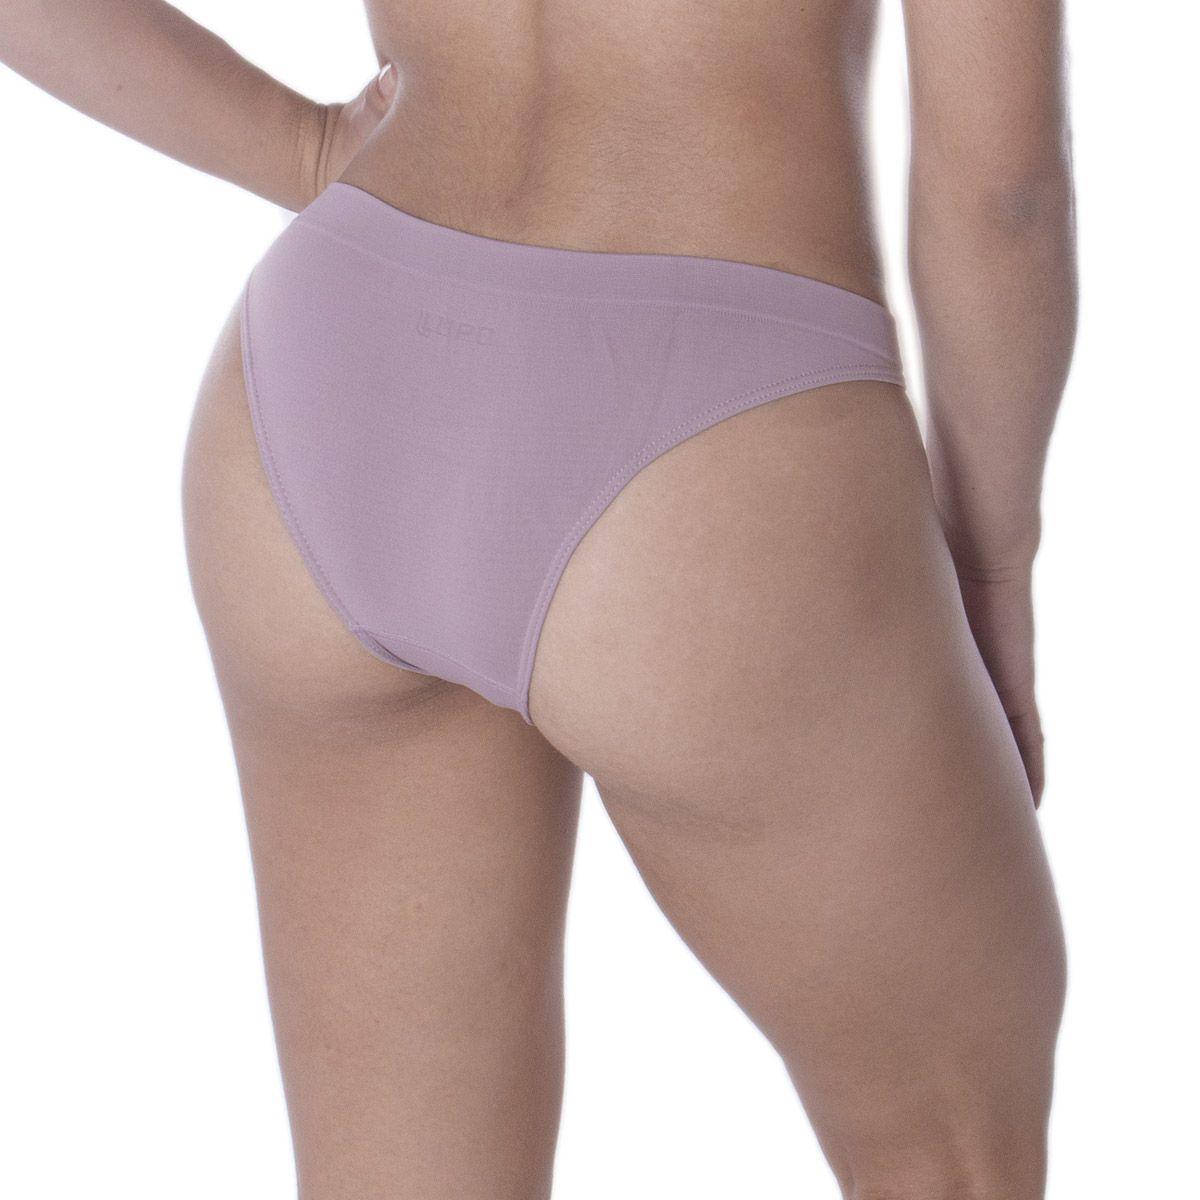 Calcinha moda intima lingerie feminina tanga sem costura microfibra Loba Lupo